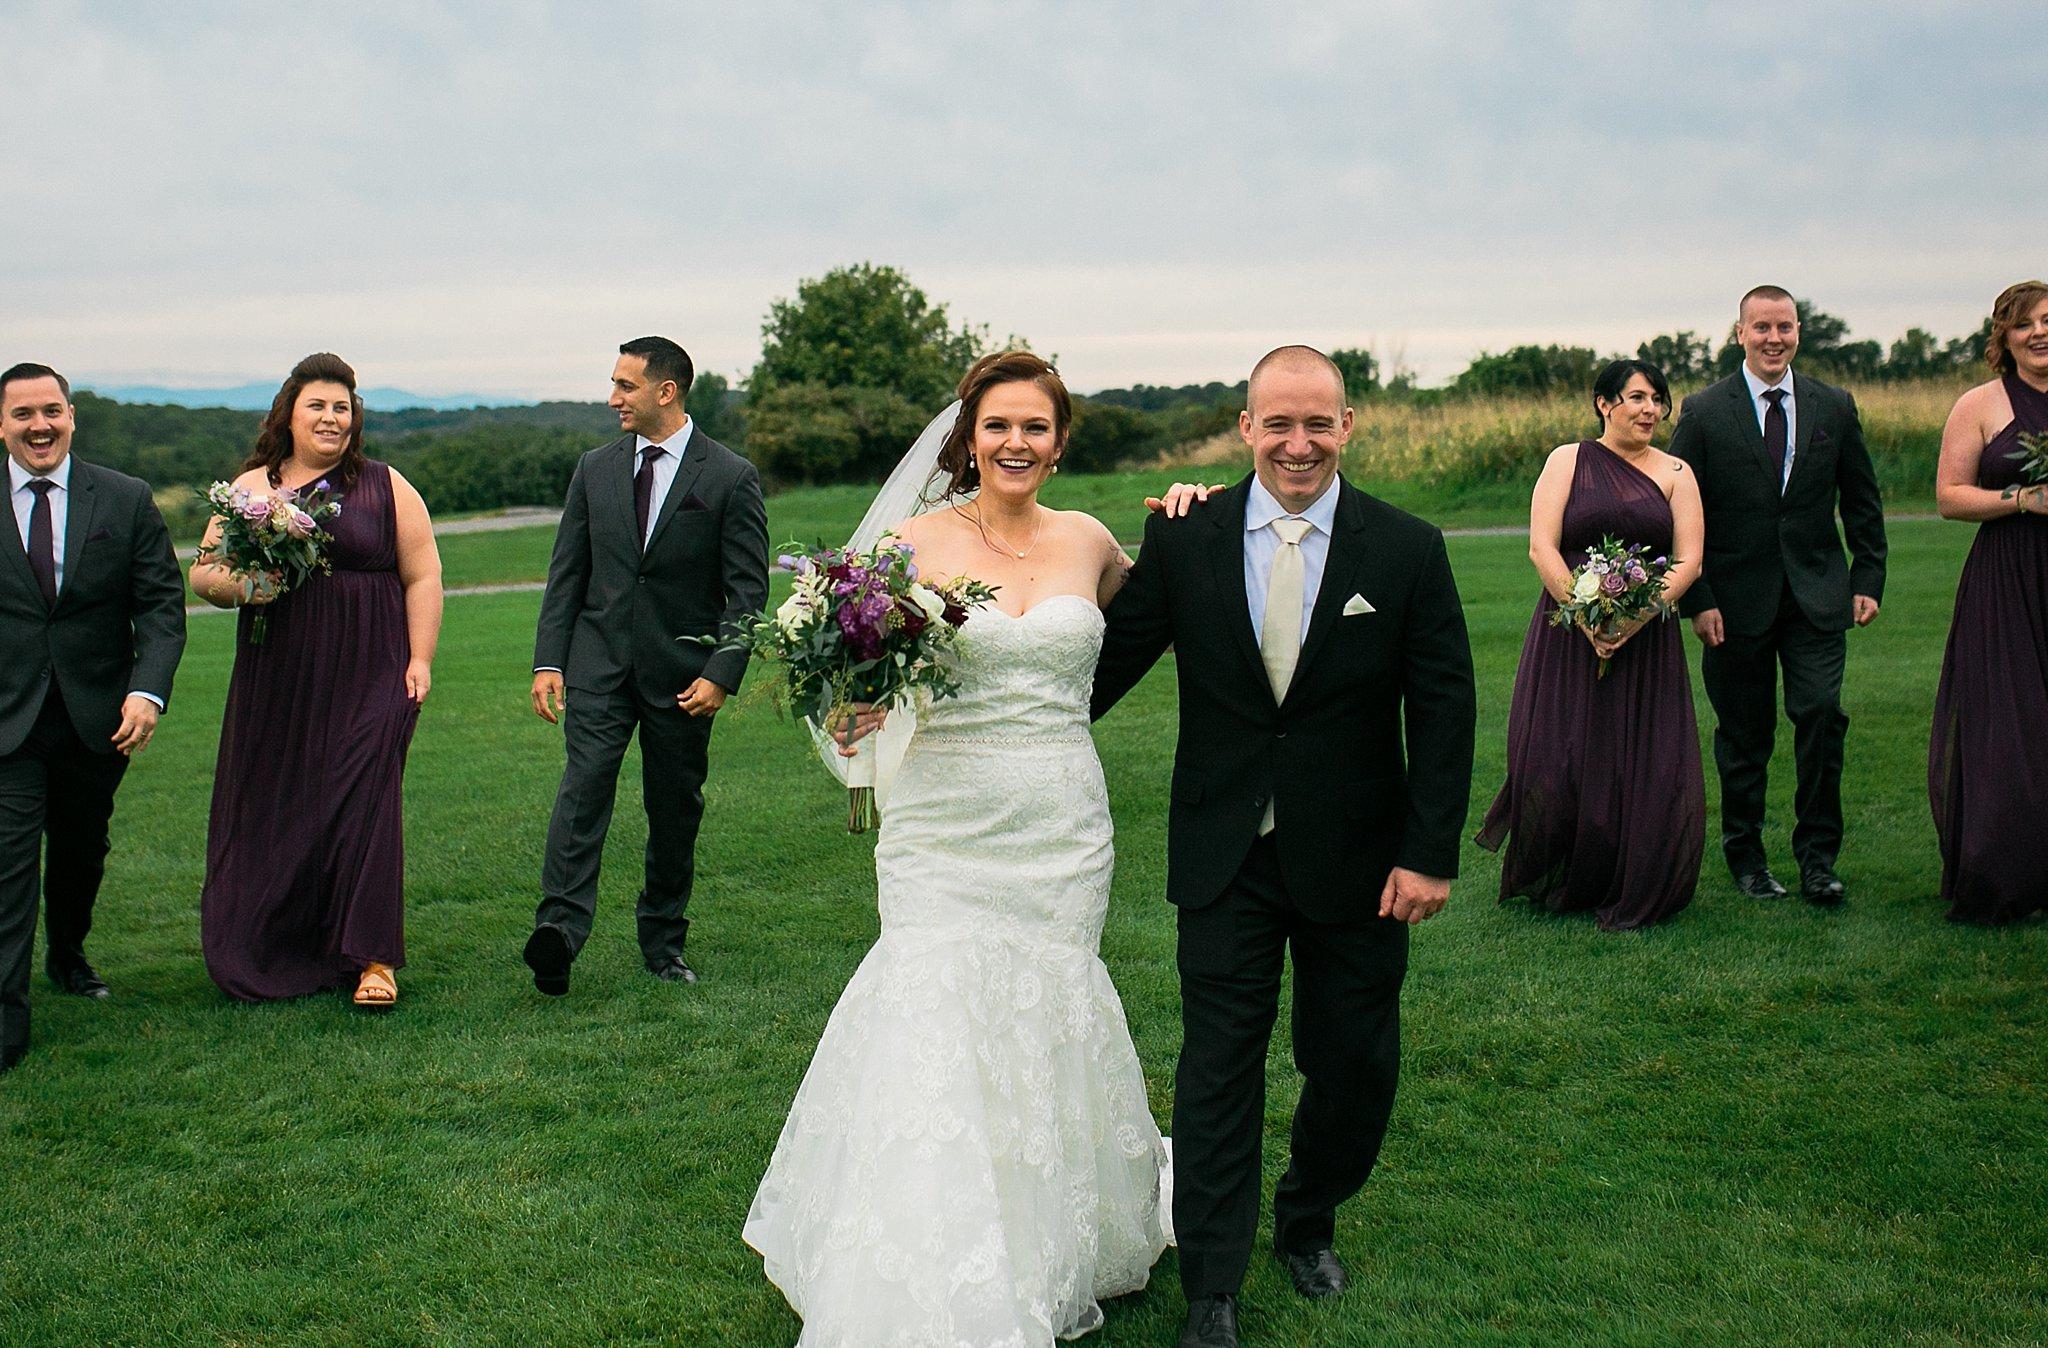 Links at Unionvale Wedding Lagrangeville Wedding Hudson Valley Wedding Photographer Sweet Alice Photography44.jpg